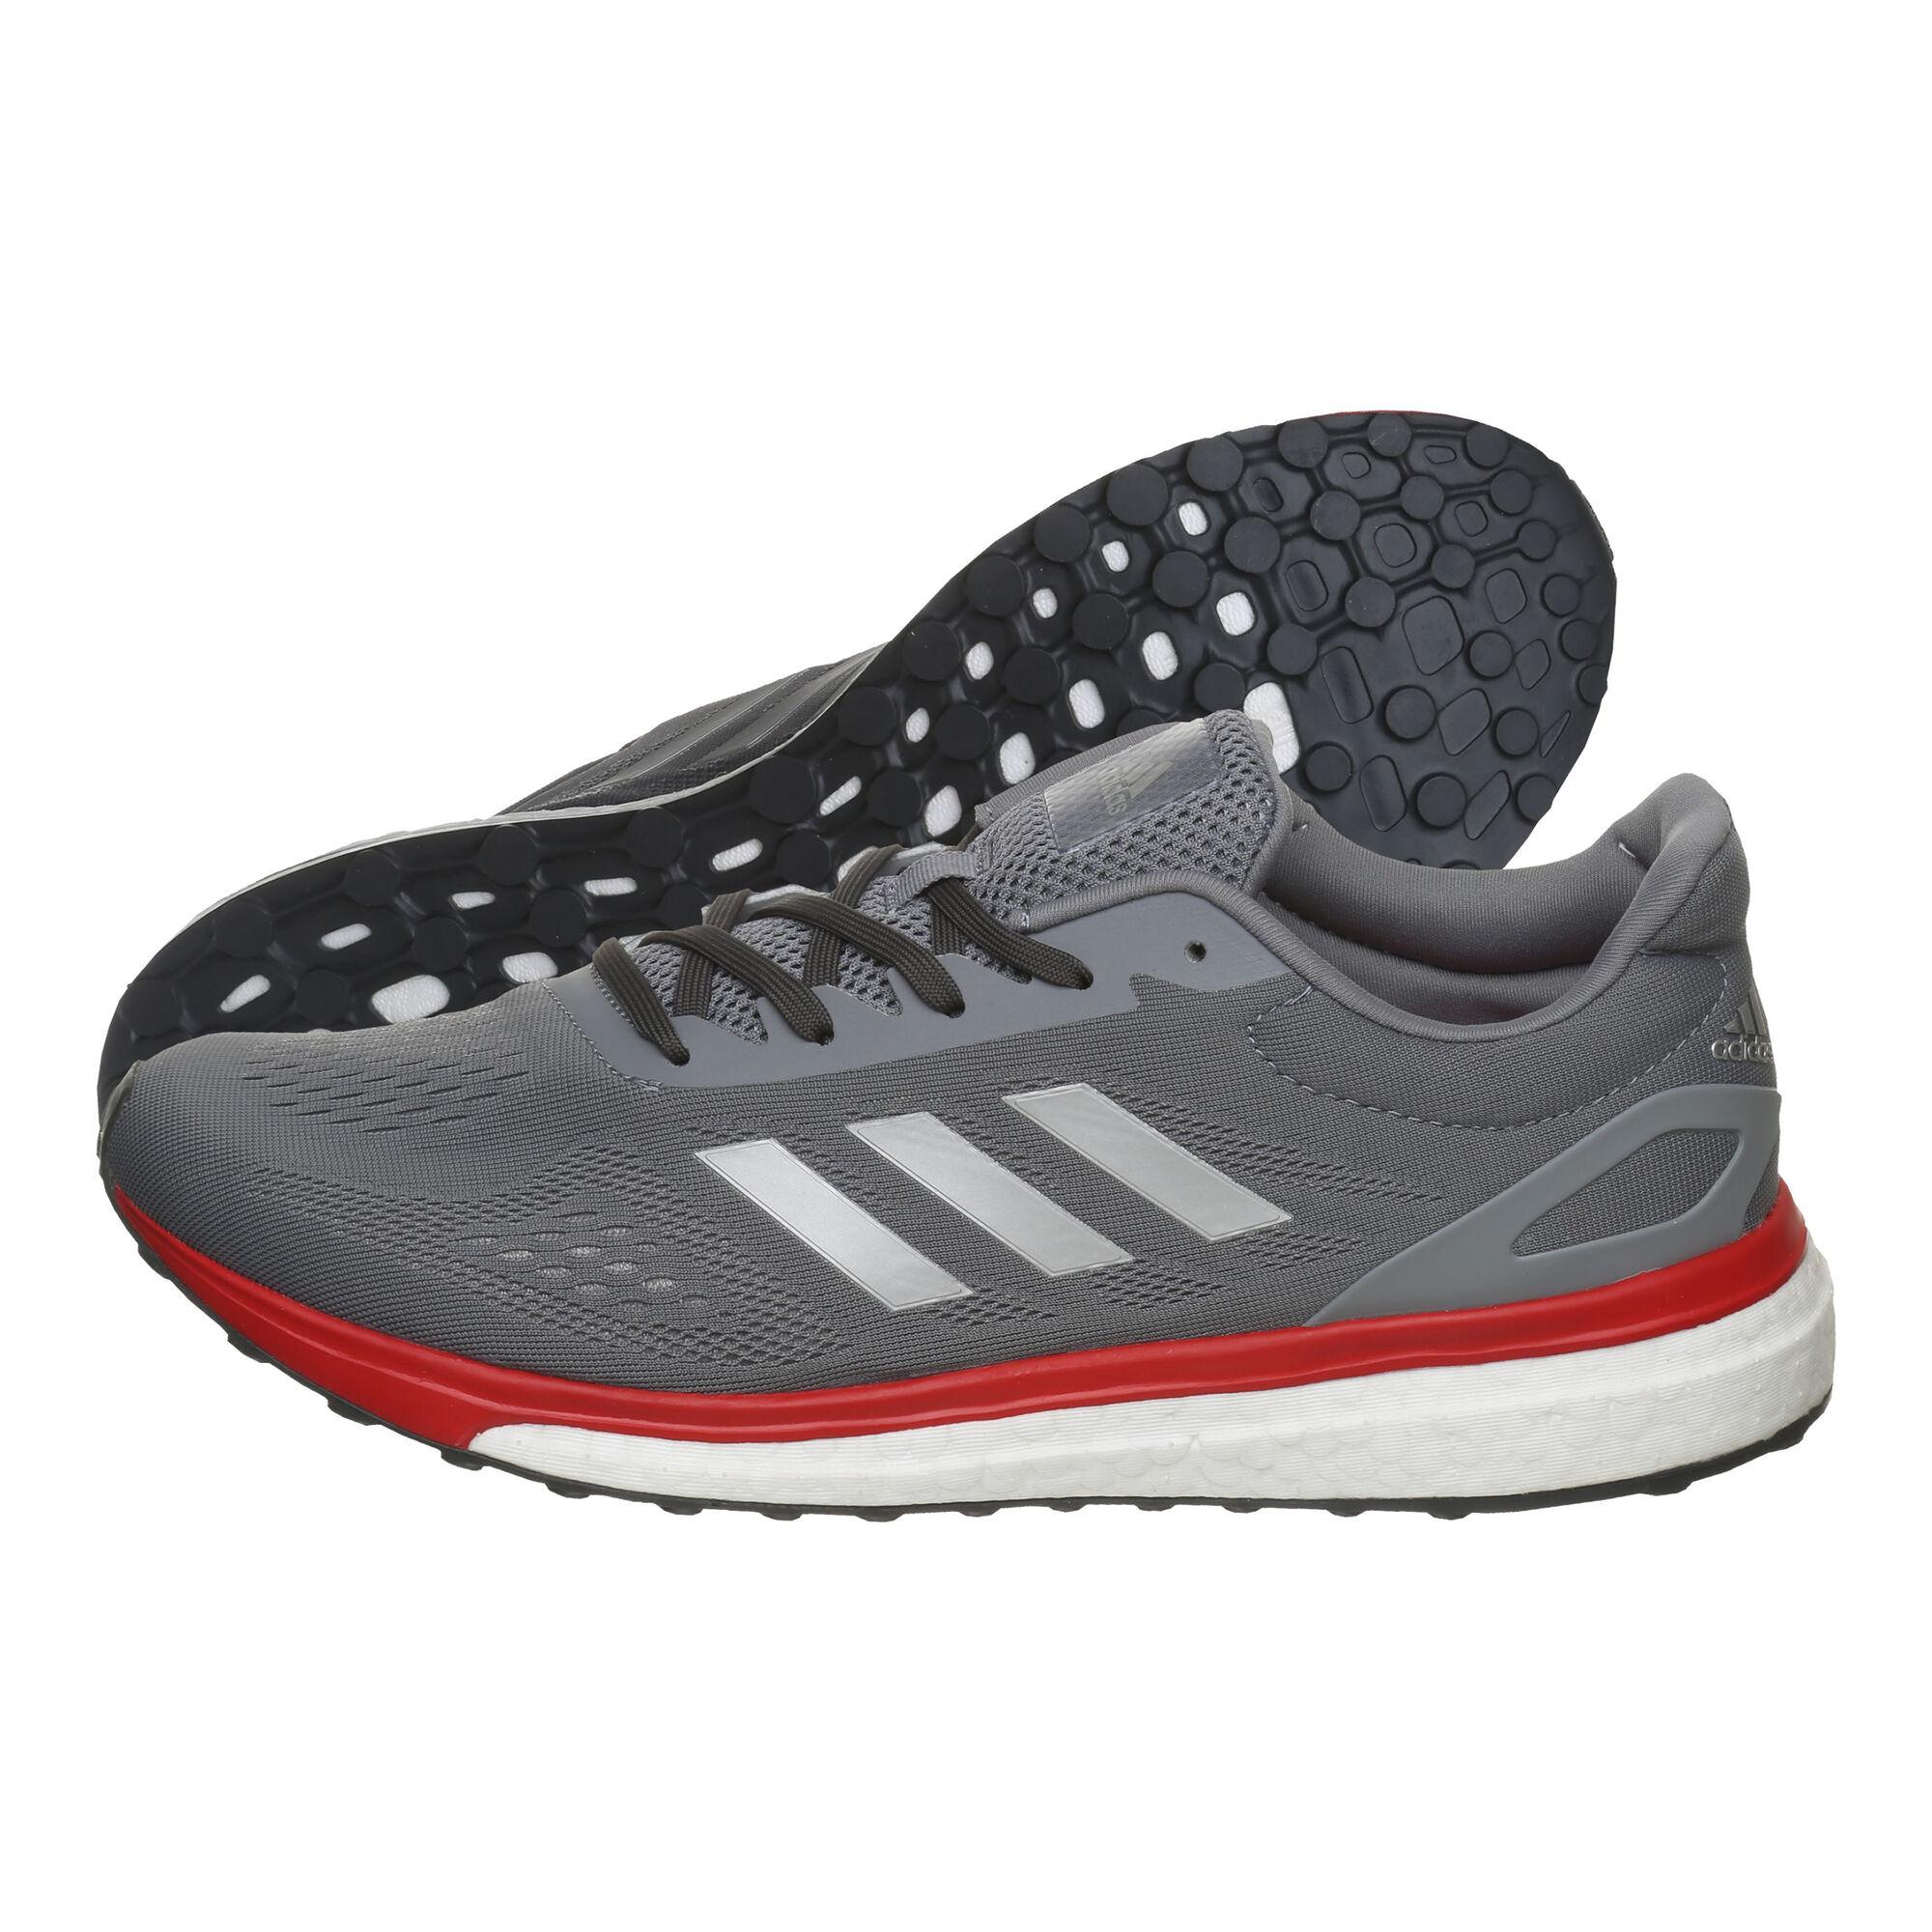 competitive price c5887 fc35c adidas · adidas · adidas · adidas · adidas ...